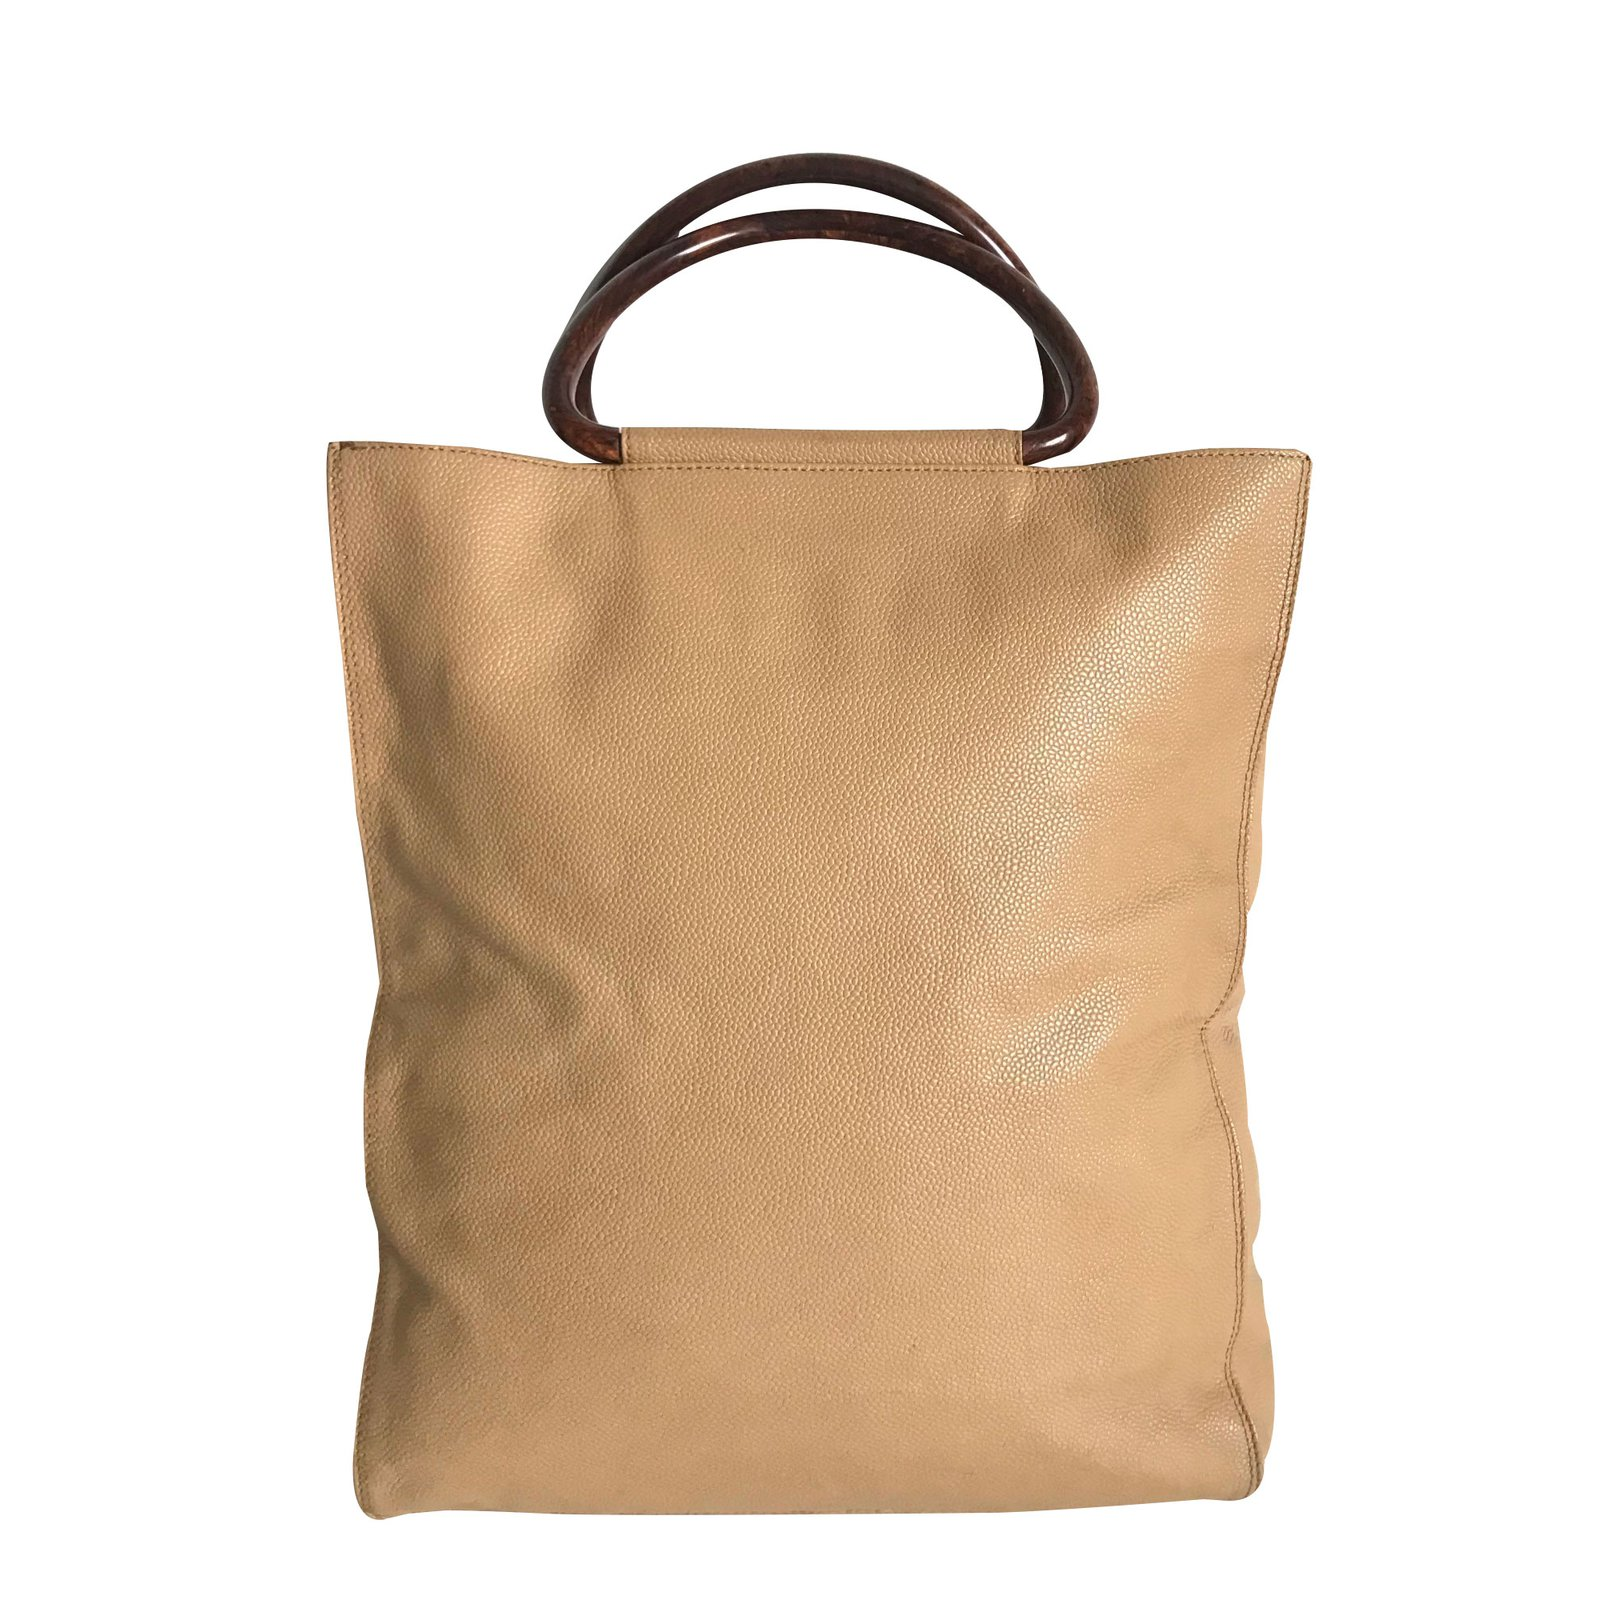 Chanel Beige Caviar Leather X Wooden Handle Tote Bag Handbags Brown Ref